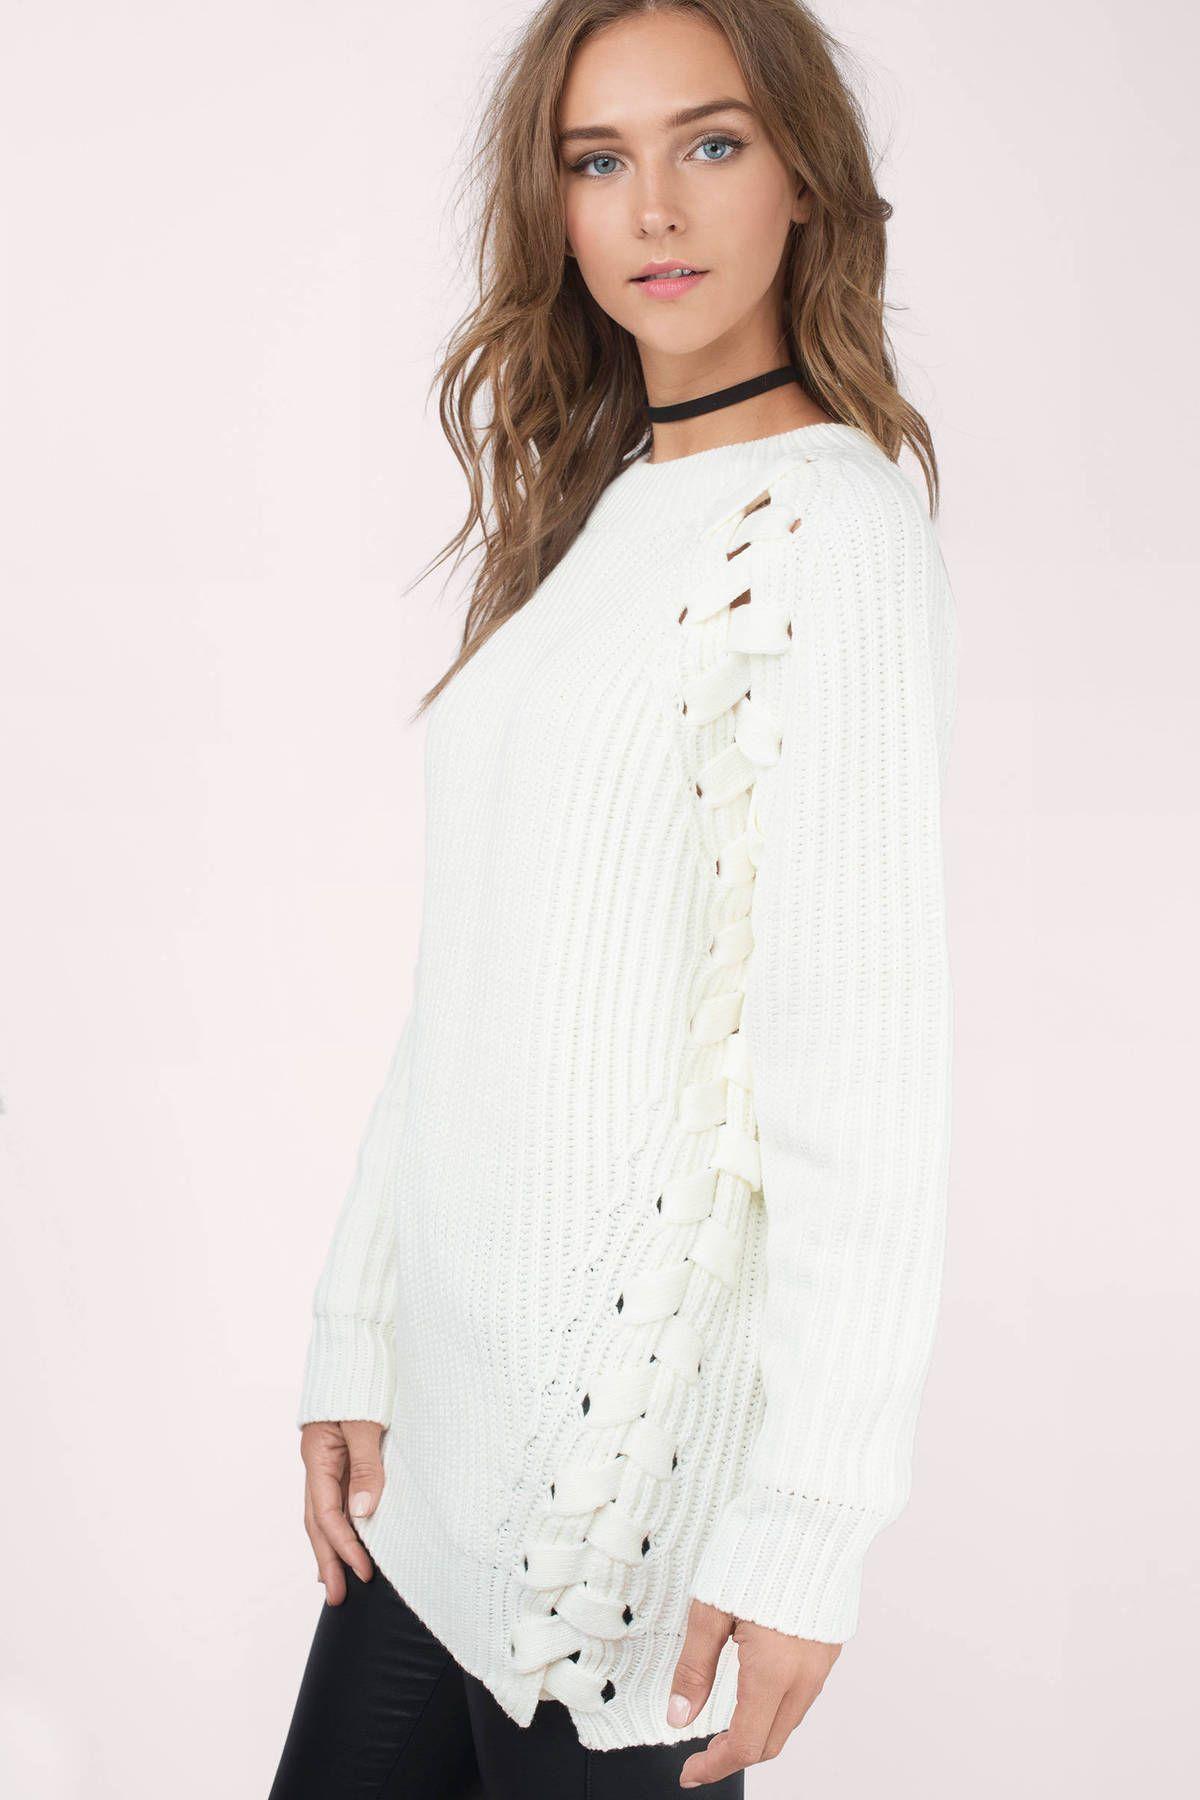 Clear Skies Lace Up Sweater at Tobi.com #shoptobi